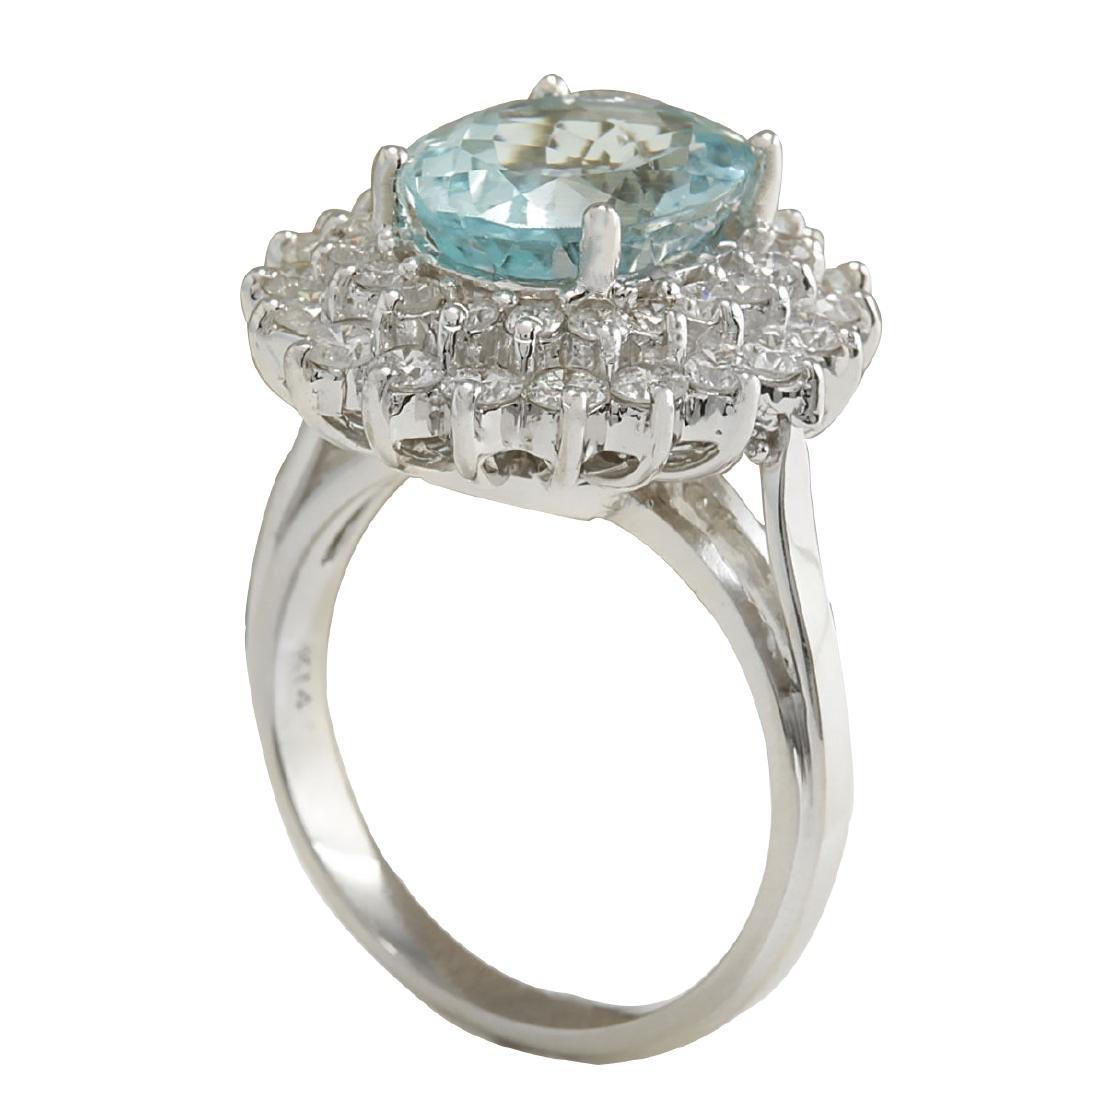 7.03CTW Natural Aquamarine And Diamond Ring In 18K - 3